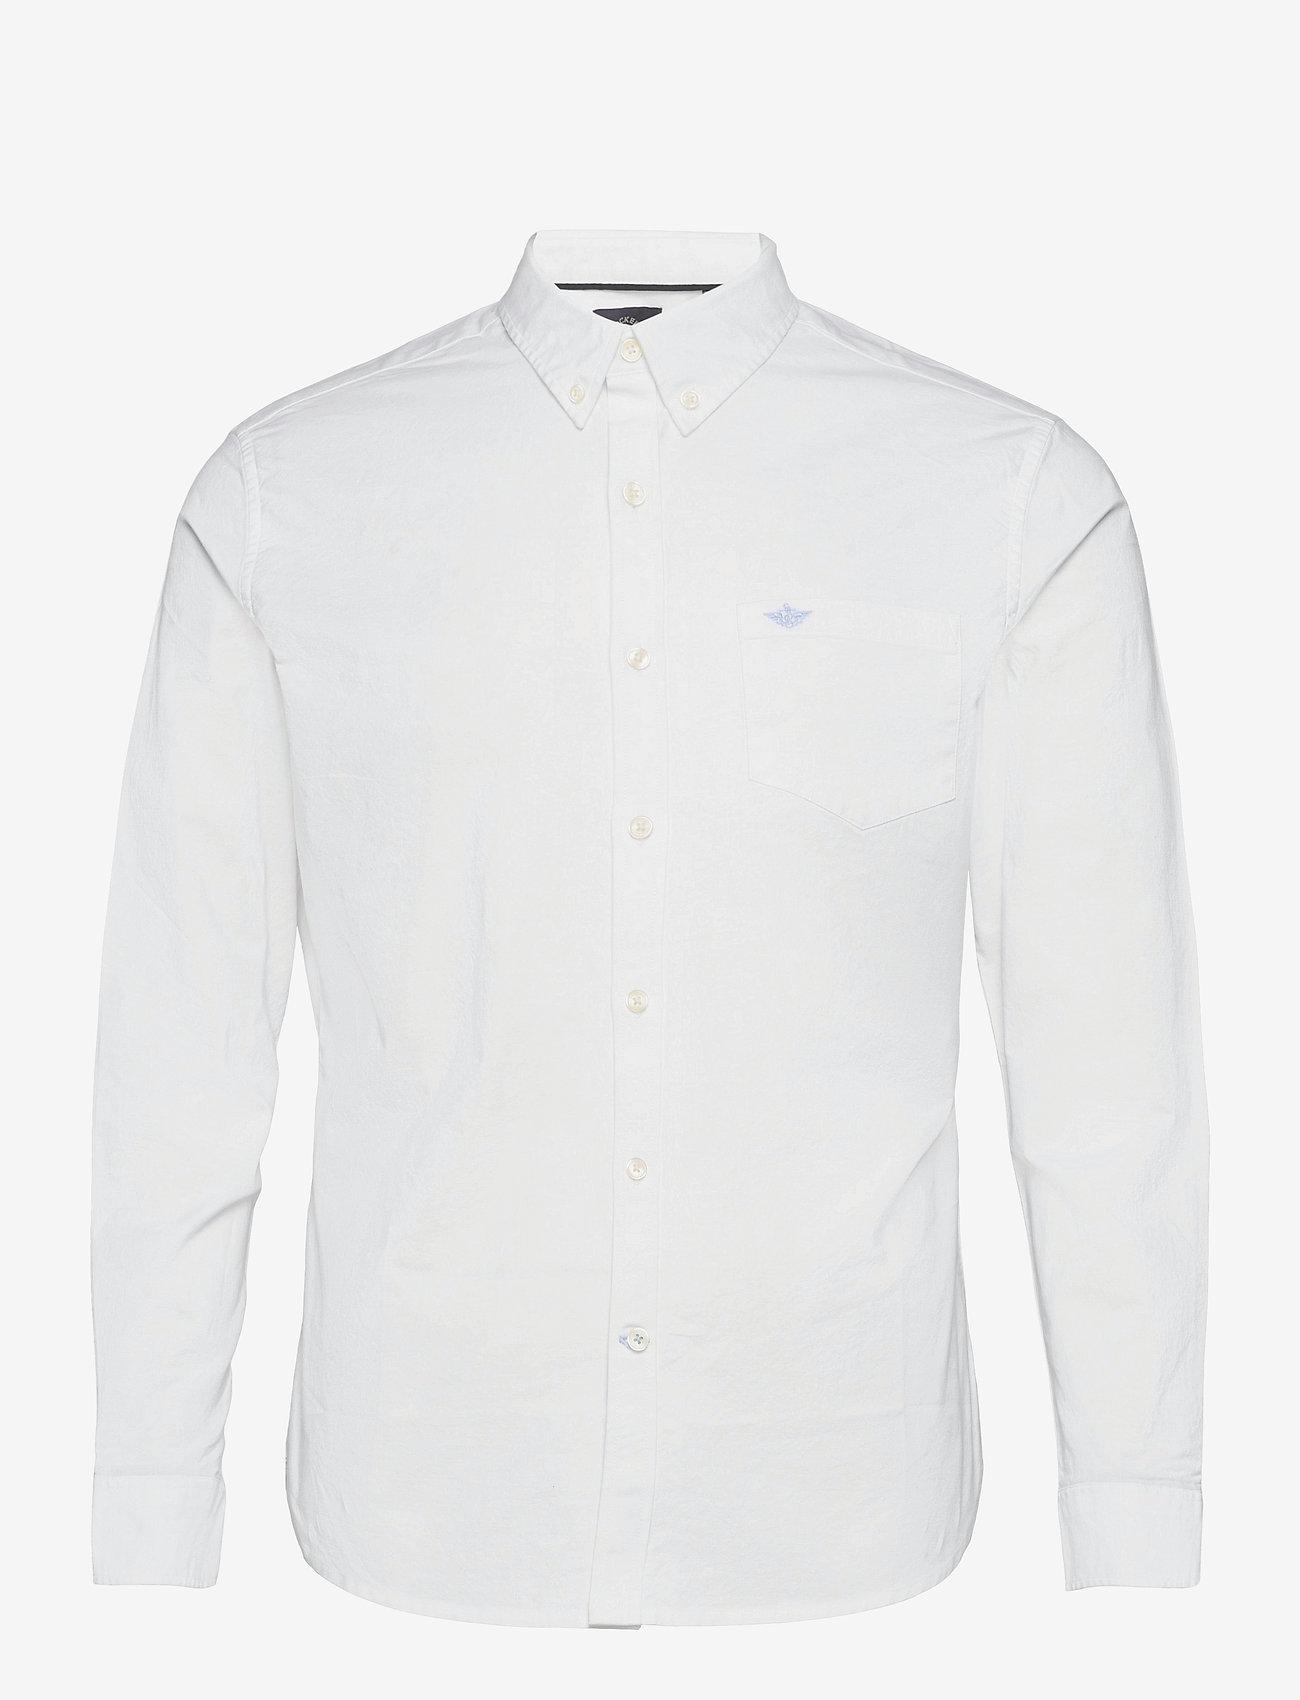 Dockers - OXFORD 2.0 PAPER WHITE - podstawowe koszulki - neutrals - 0